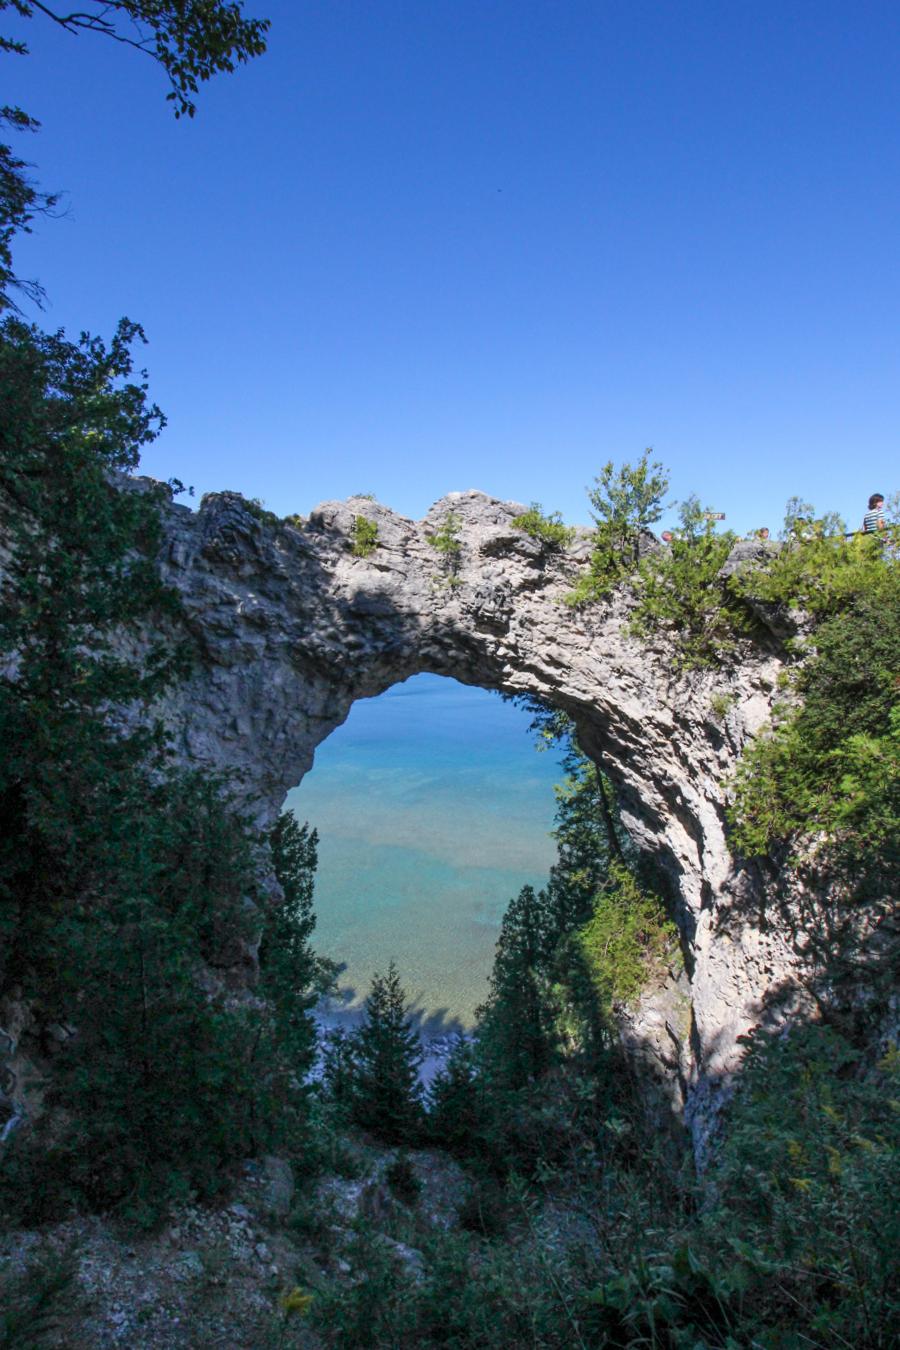 Arch Rock, a natural limestone arch on Mackinac Island